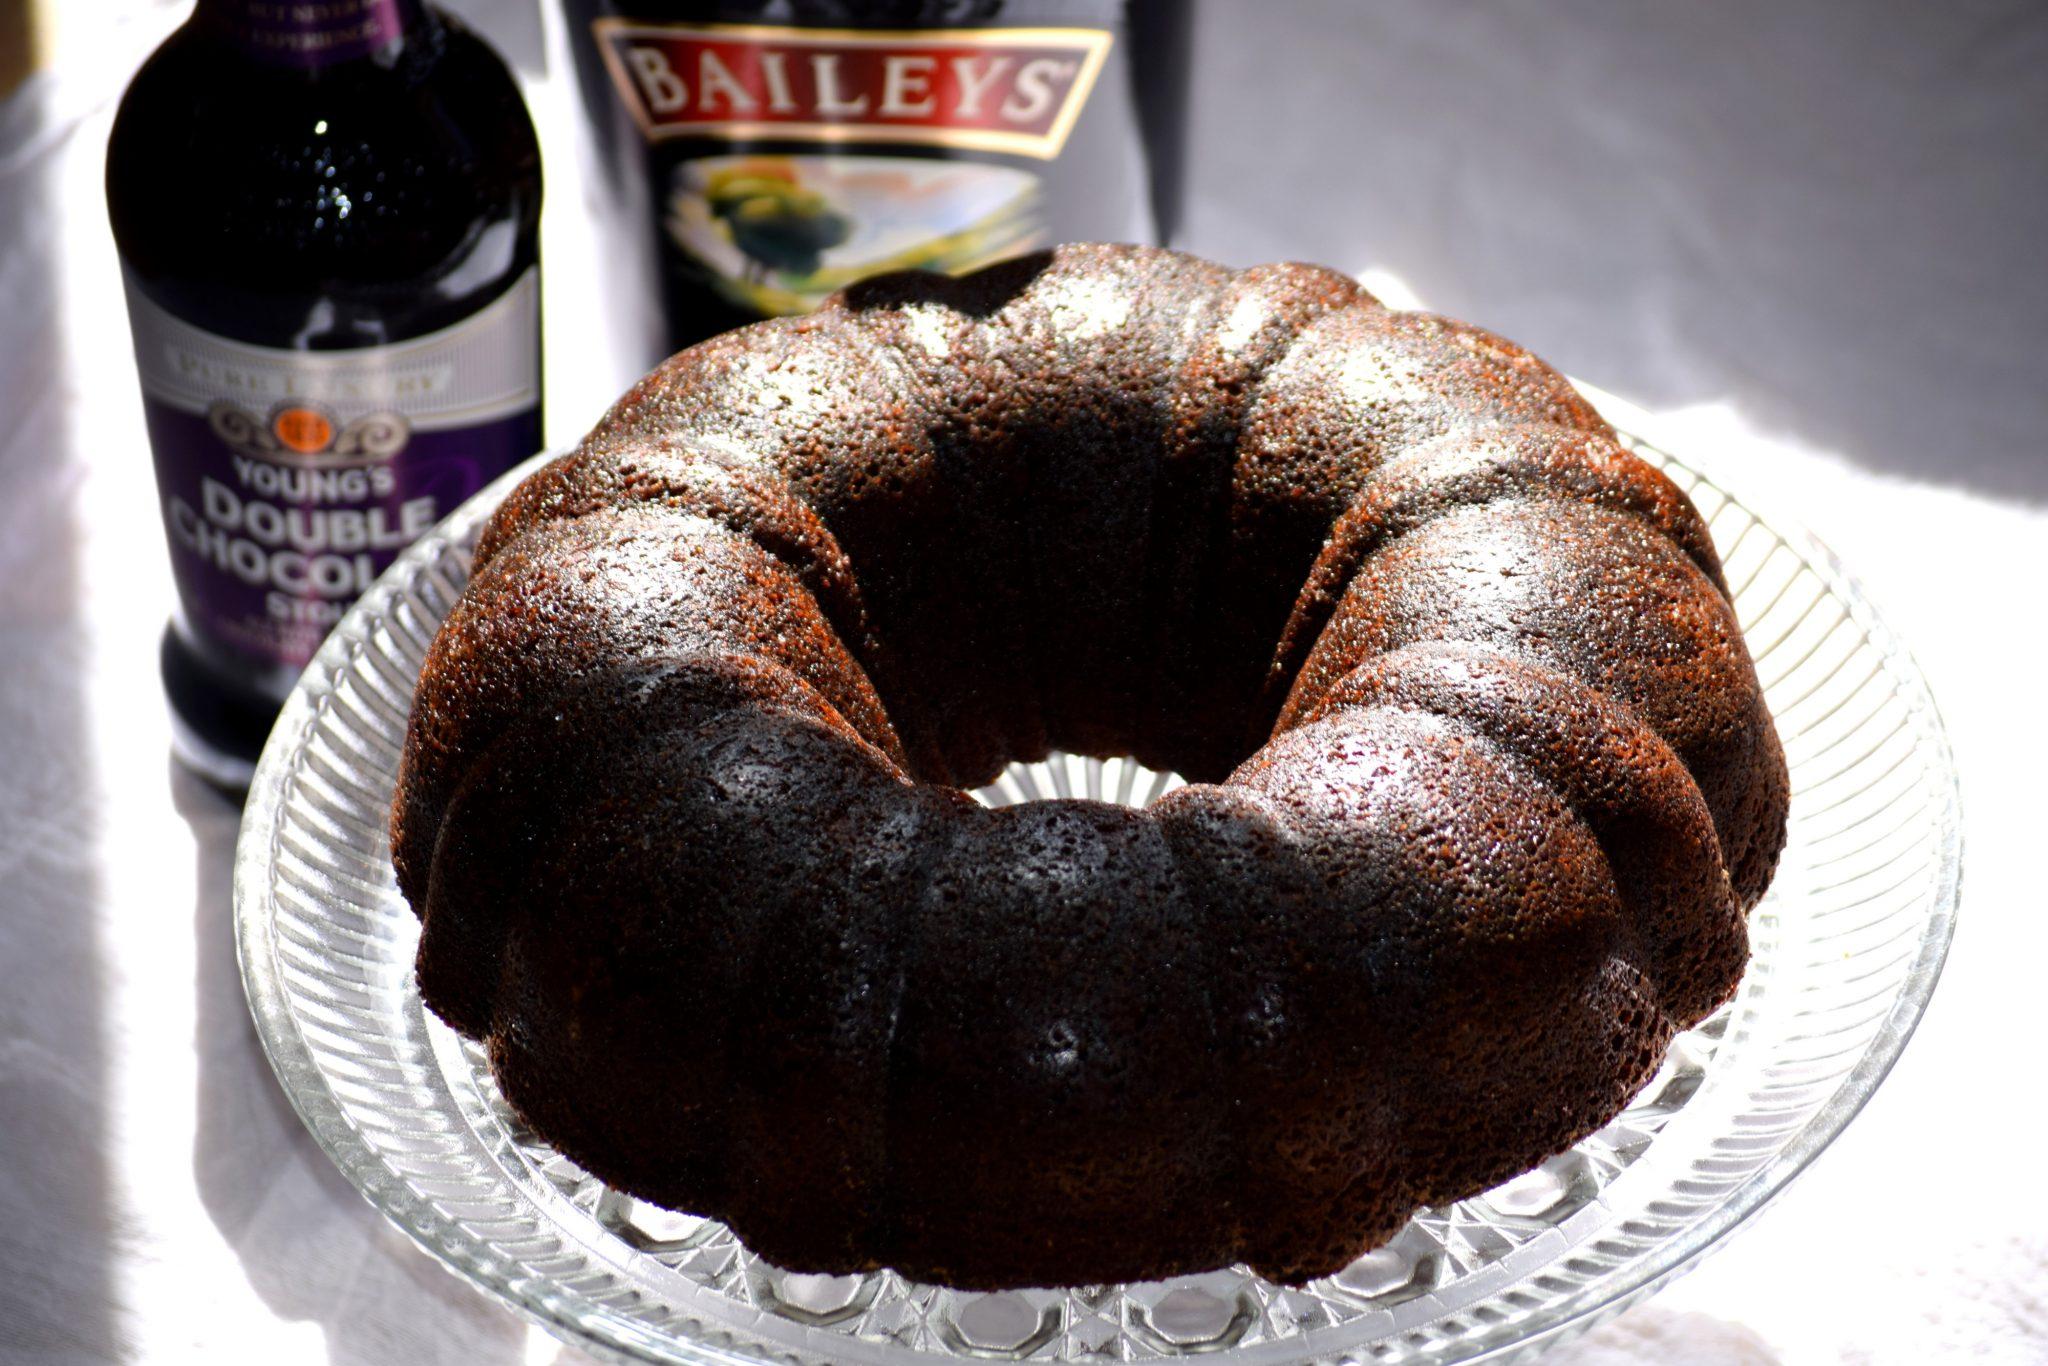 Double Chocolate Stout Bundt Cake with Bailey's Irish Creme Caramel Sauce